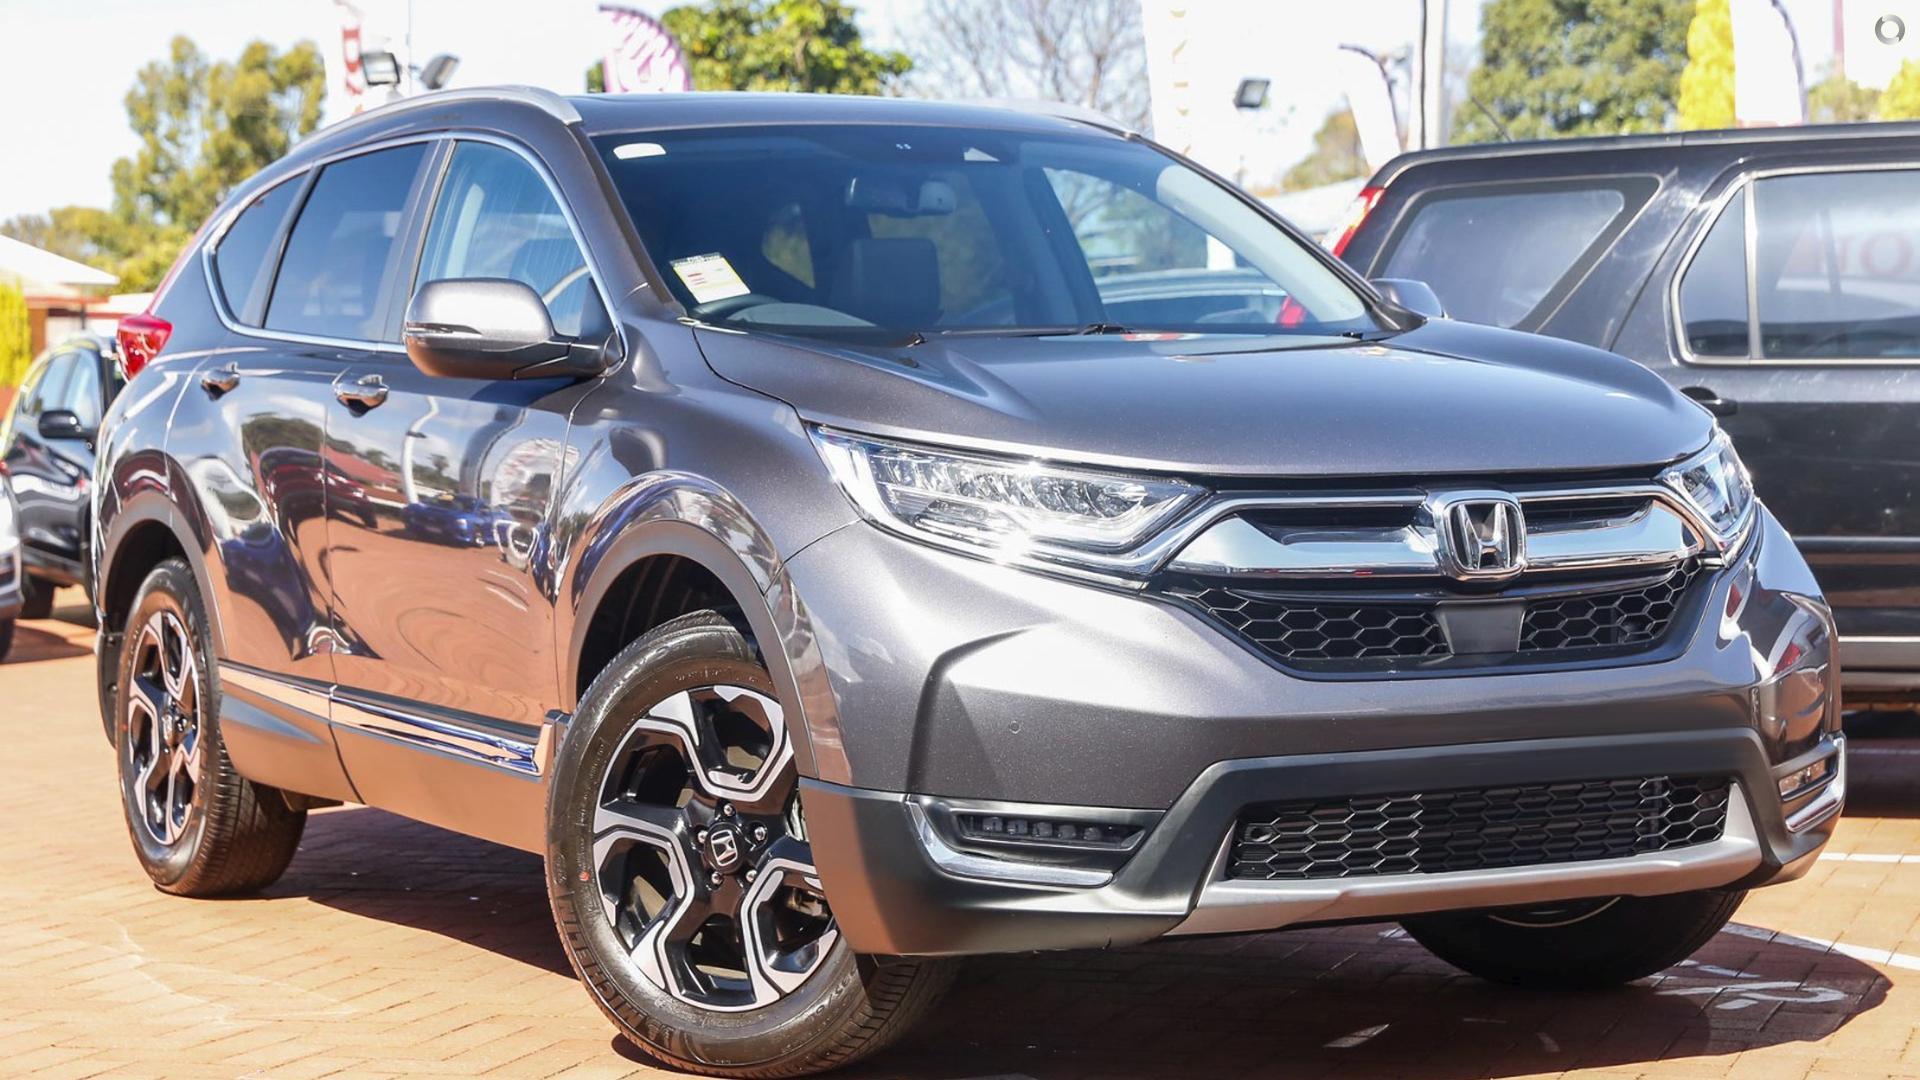 2017 Honda Cr-v RW